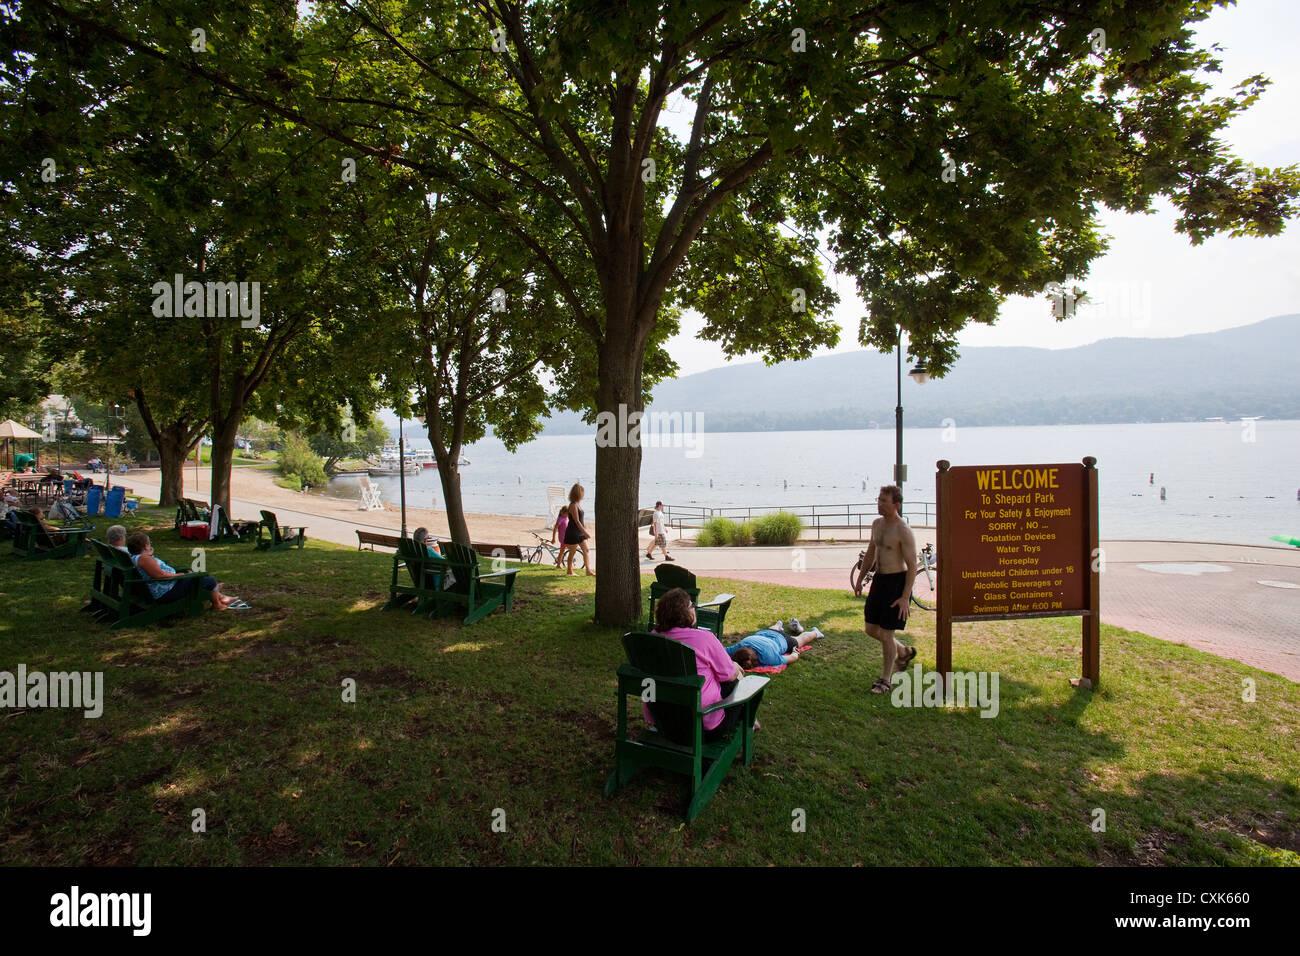 Shepard Park, Lake George, NY - Stock Image